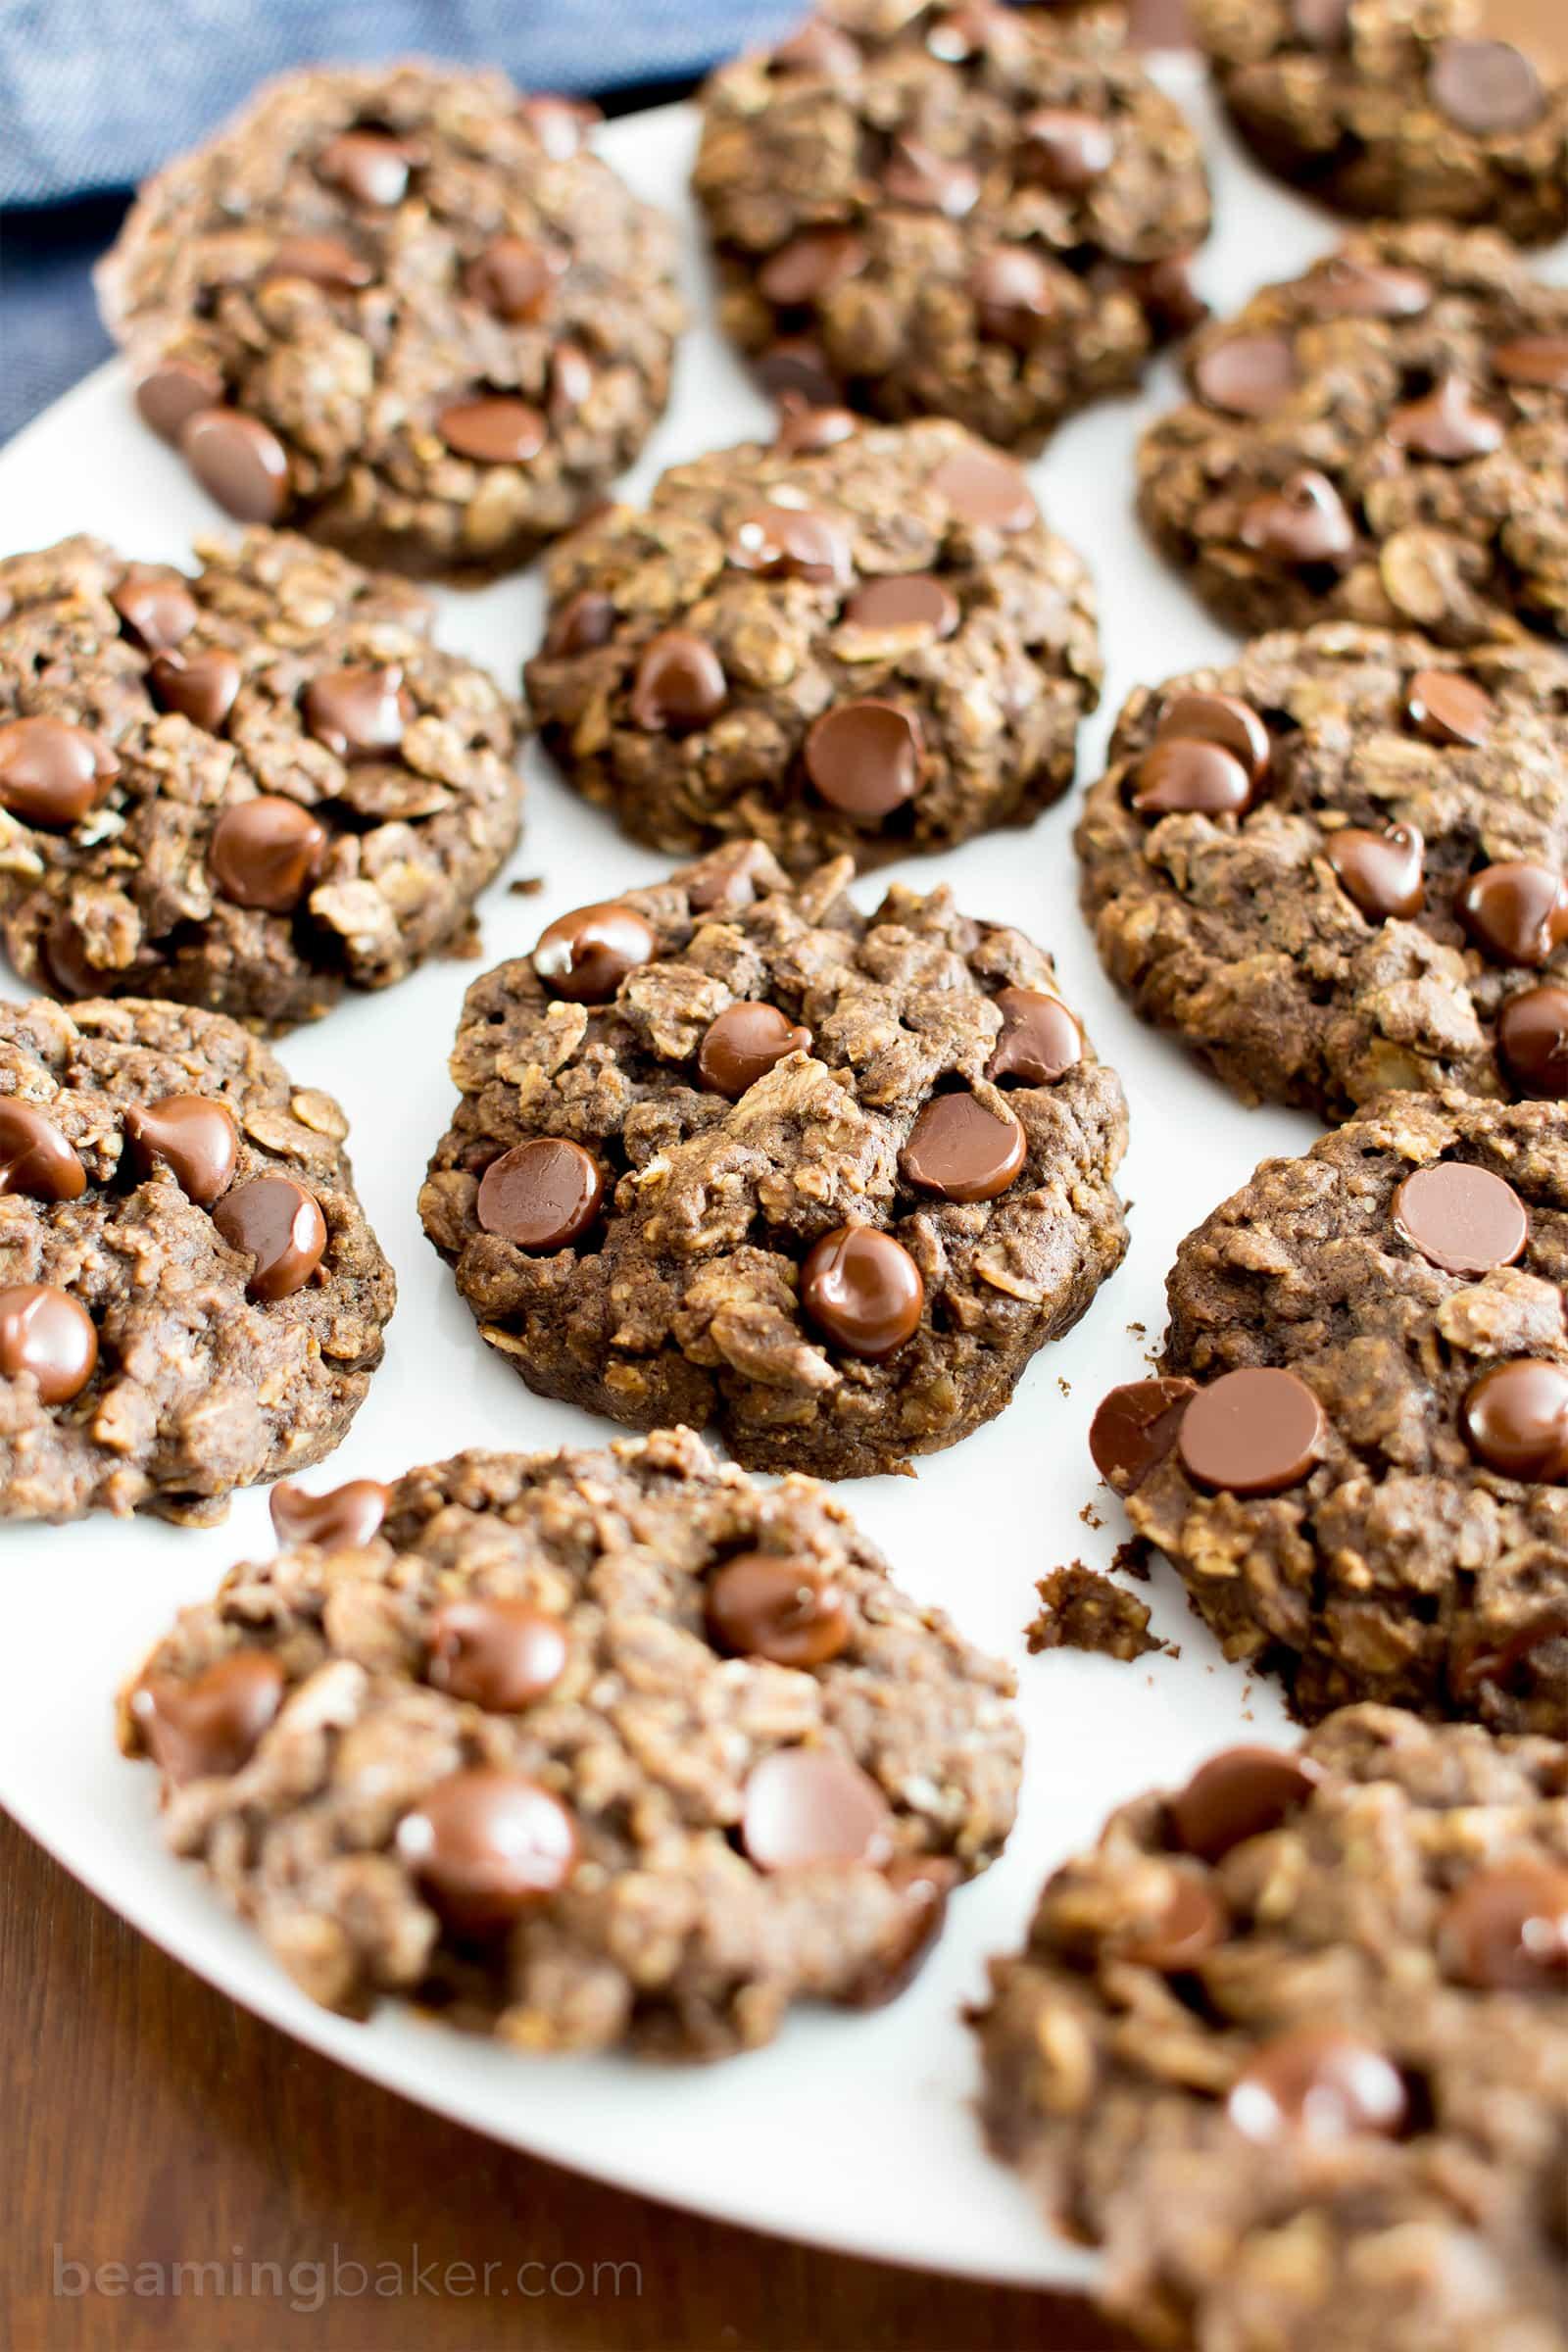 Gluten Free Double Chocolate Chip Oatmeal Cookies (V, GF): an easy recipe for soft, chewy double chocolate chip oatmeal cookies made with whole ingredients. #Vegan #GlutenFree #DairyFree #WholeGrain #OatFlour   BeamingBaker.com